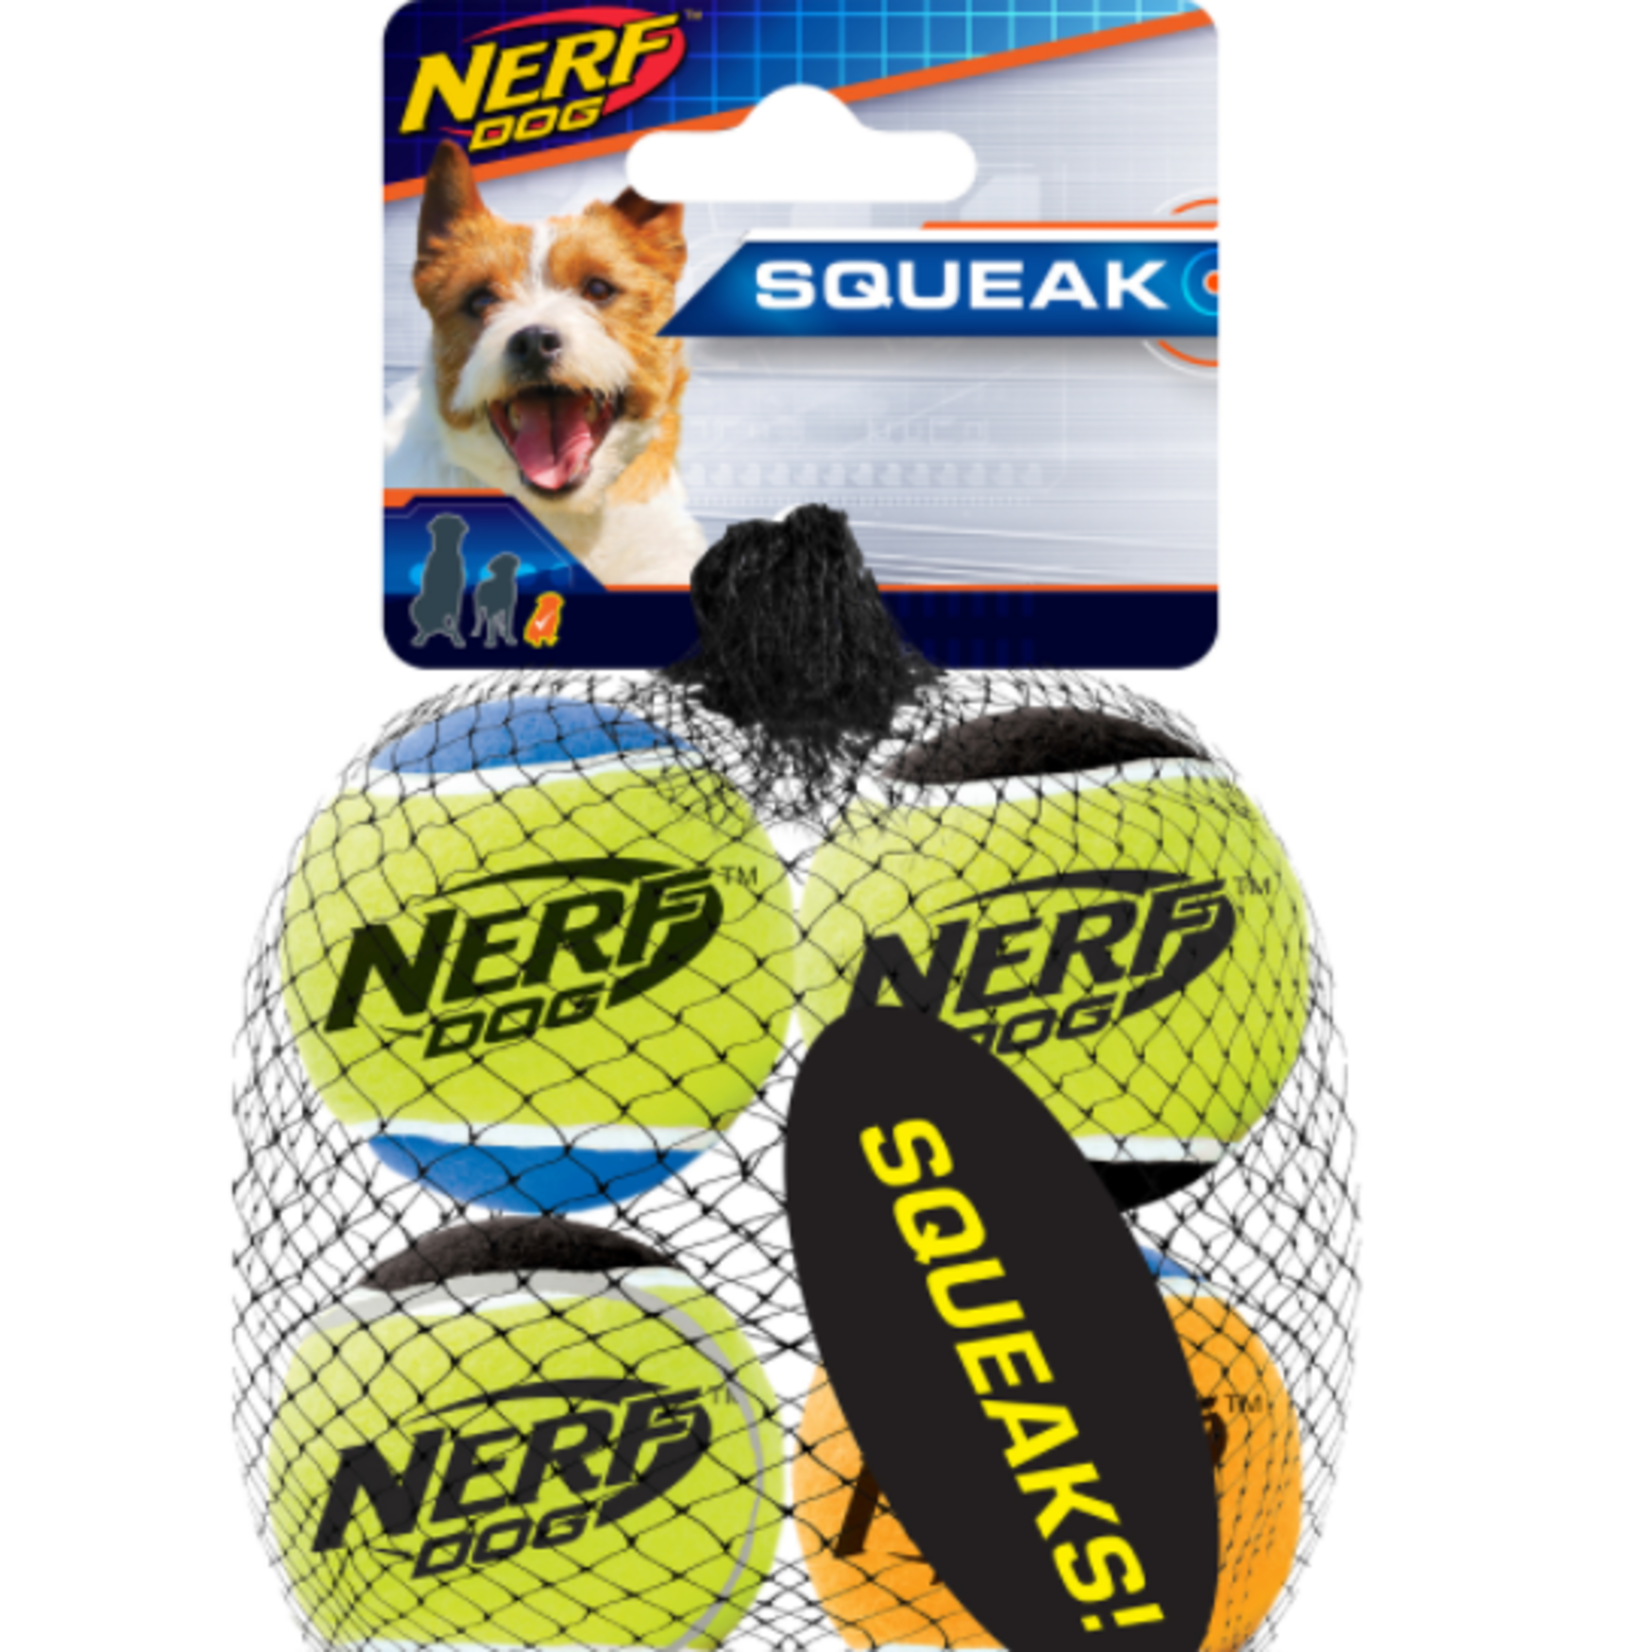 Nerf Squeak Tennis Balls - 4 Pack - XSmall - 4.4 cm